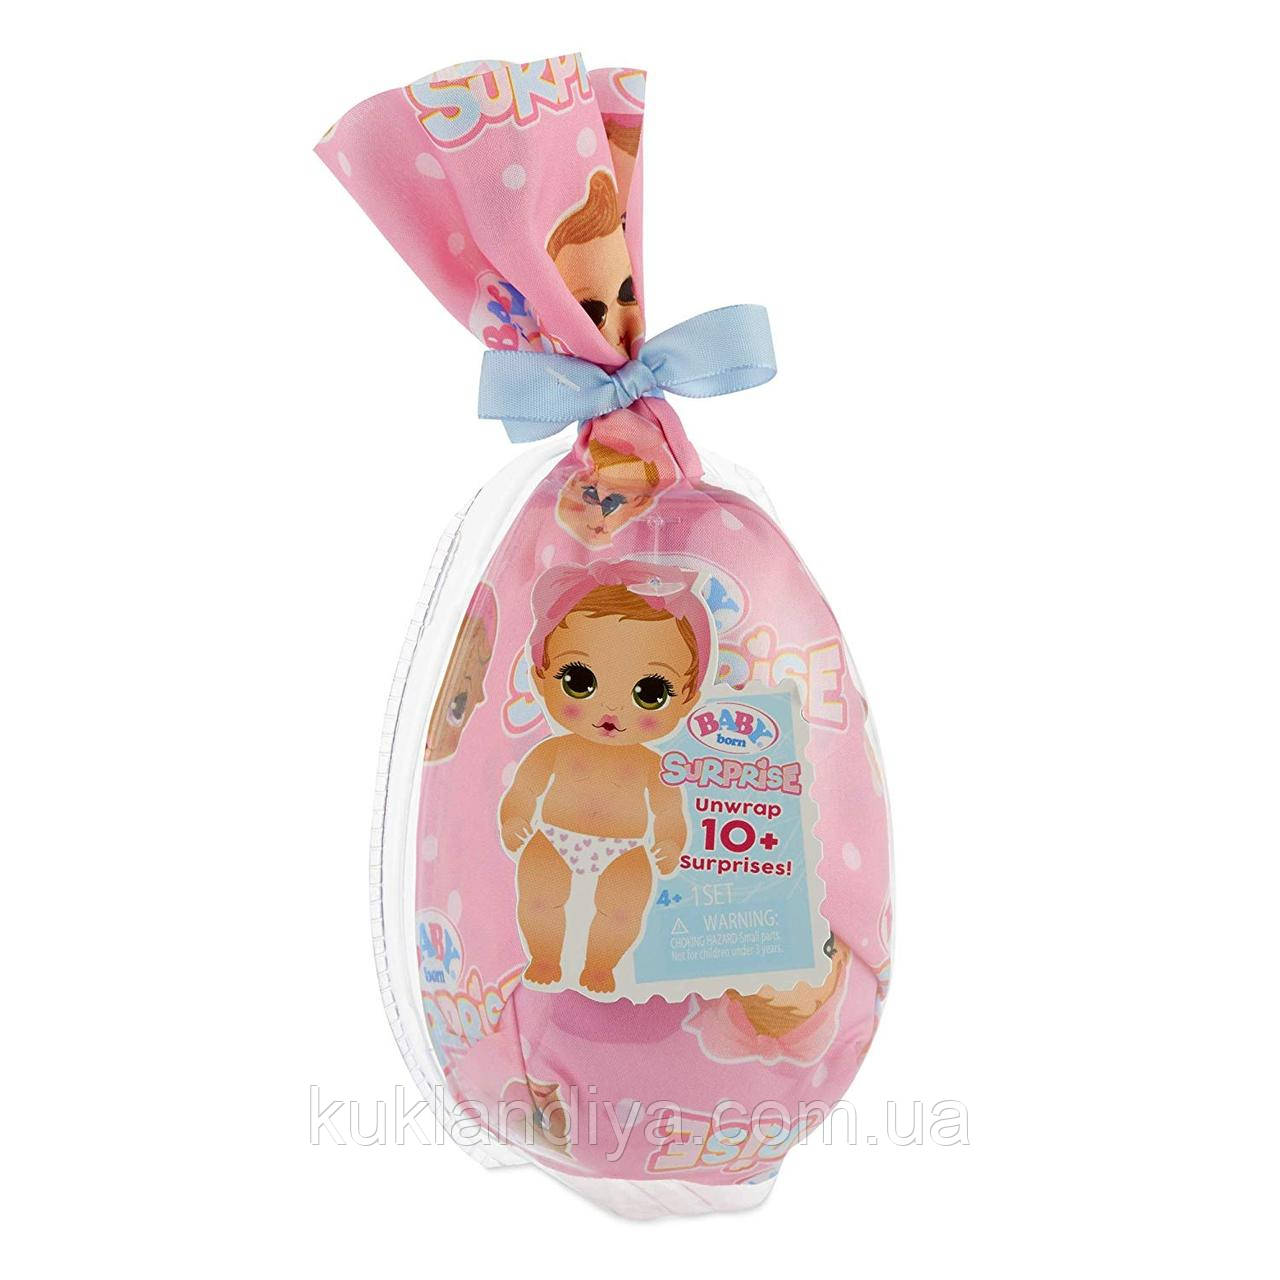 Baby born surprise / Беби Борн сюрприз Zapf Creation